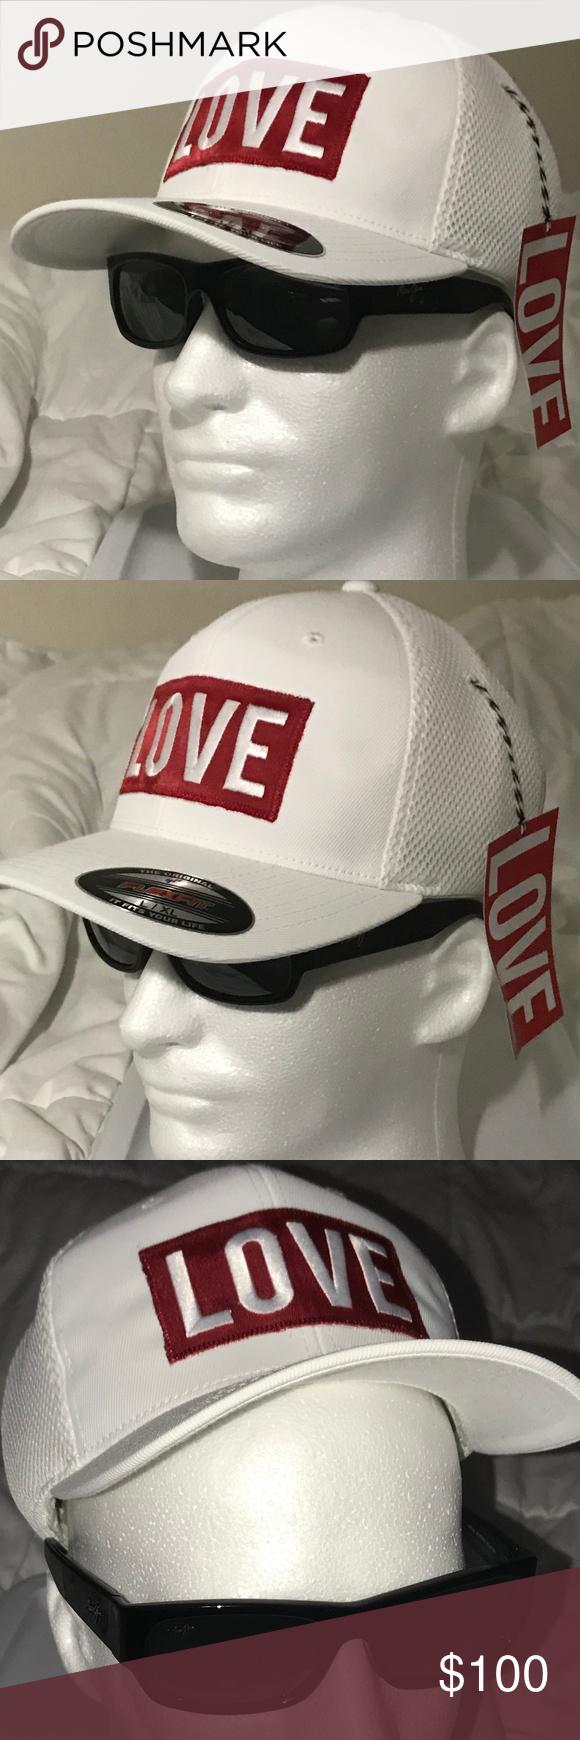 Limited Edition L Xl White Love The Hat Vip Clothes Design Fashion Clubwear